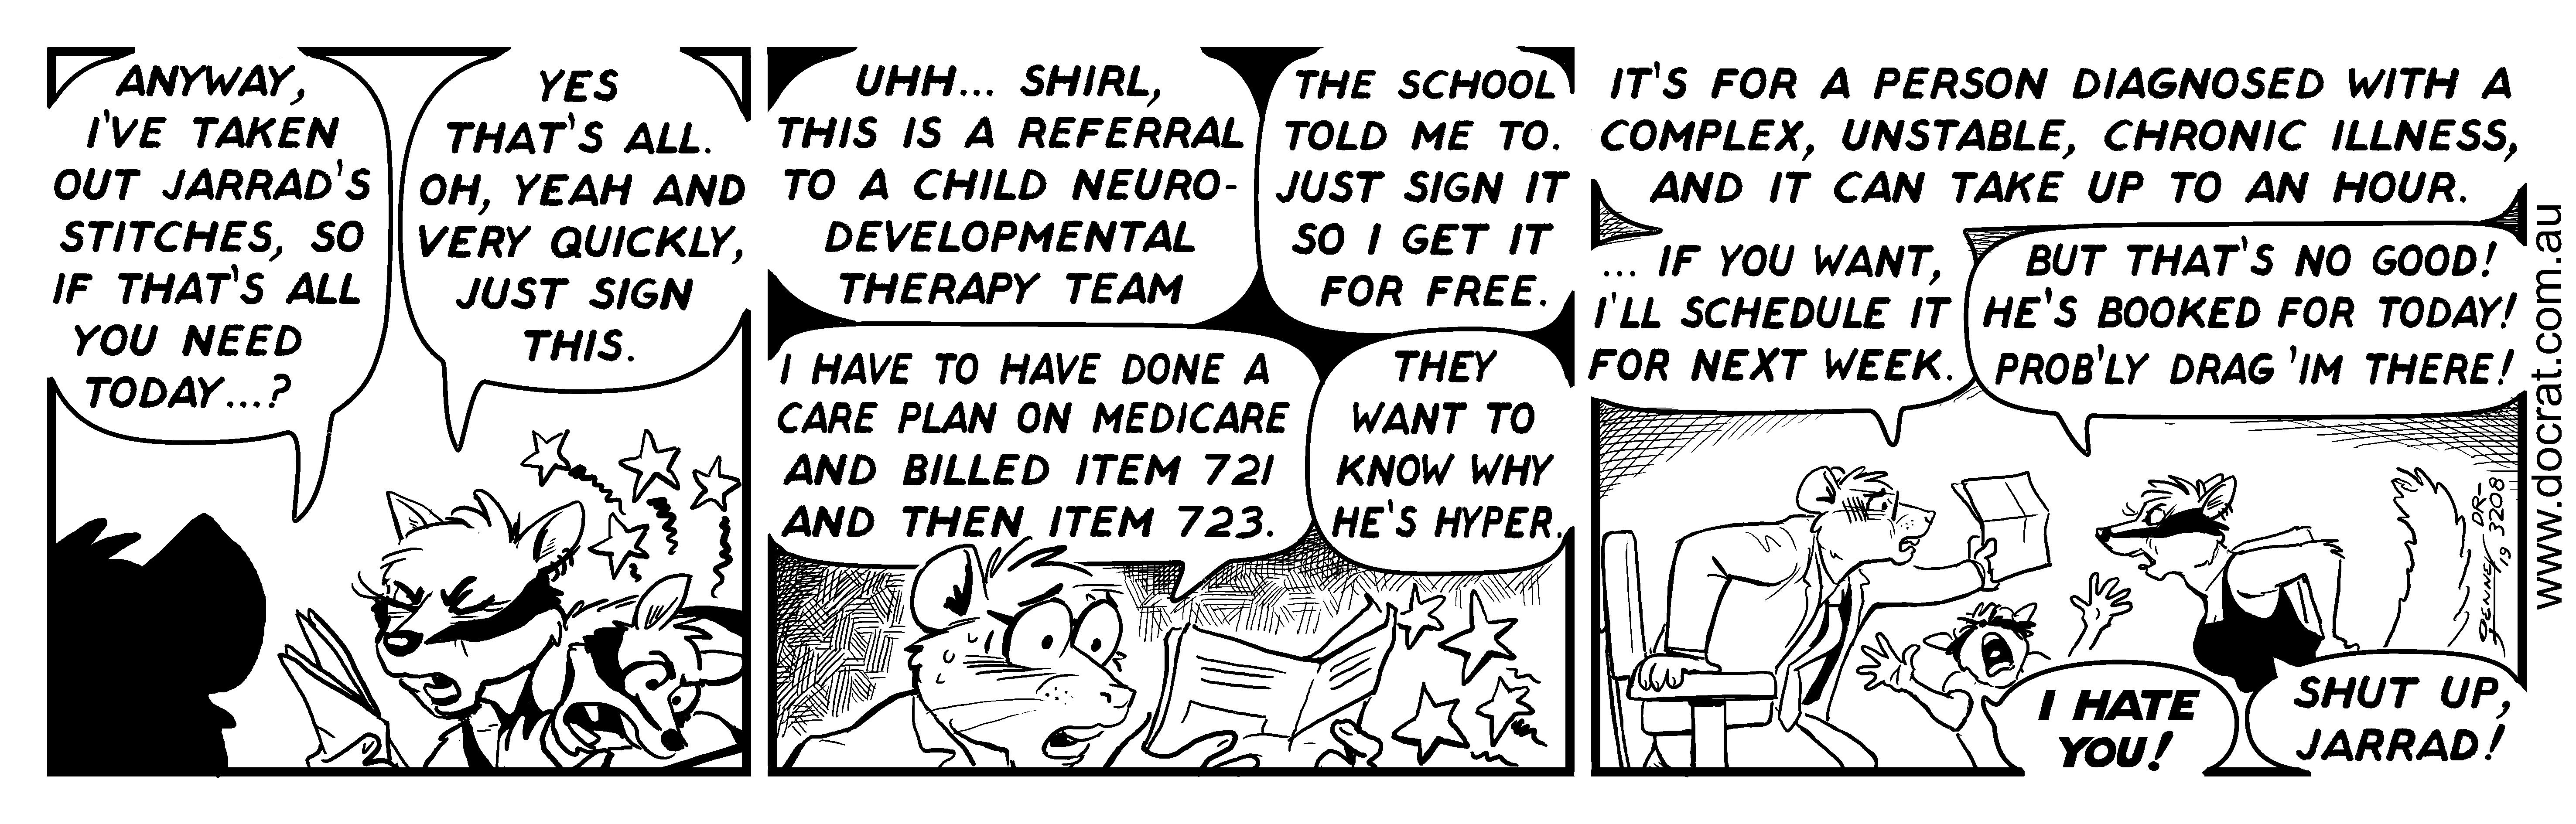 20190327